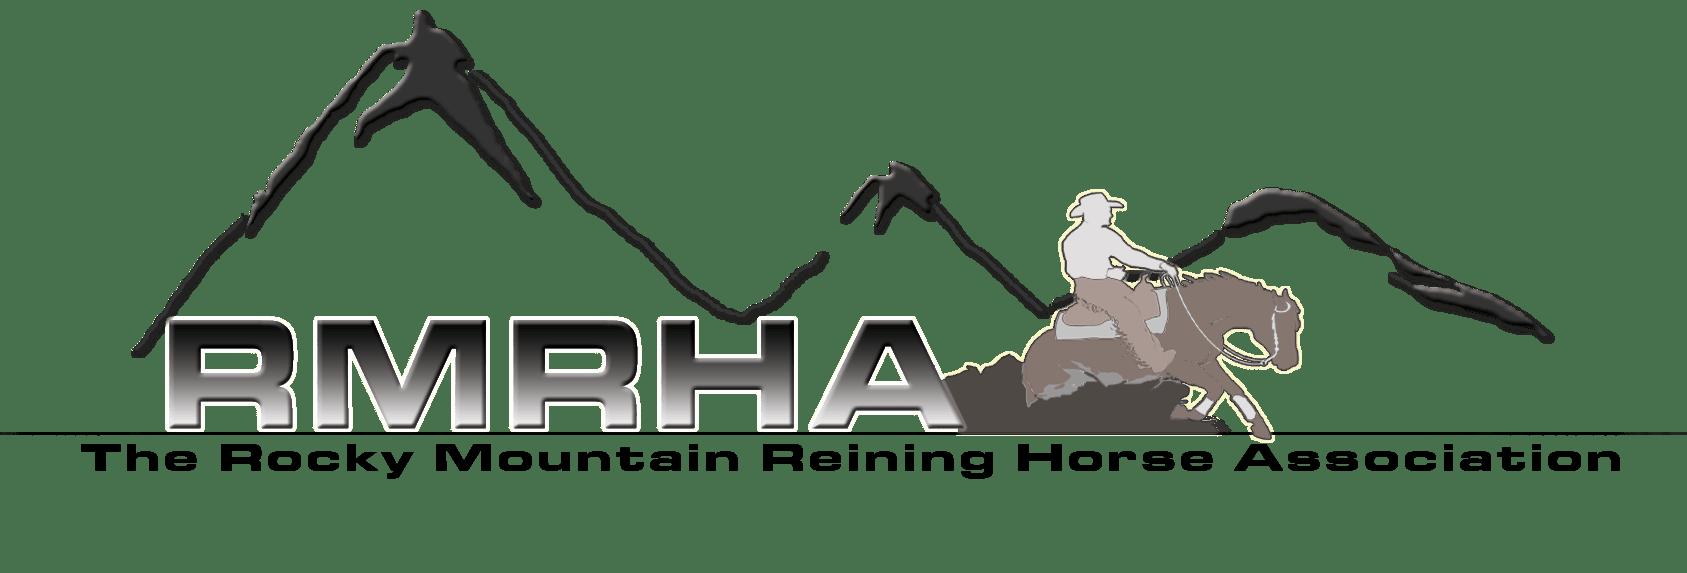 Rocky Mountain Reining Horse Association